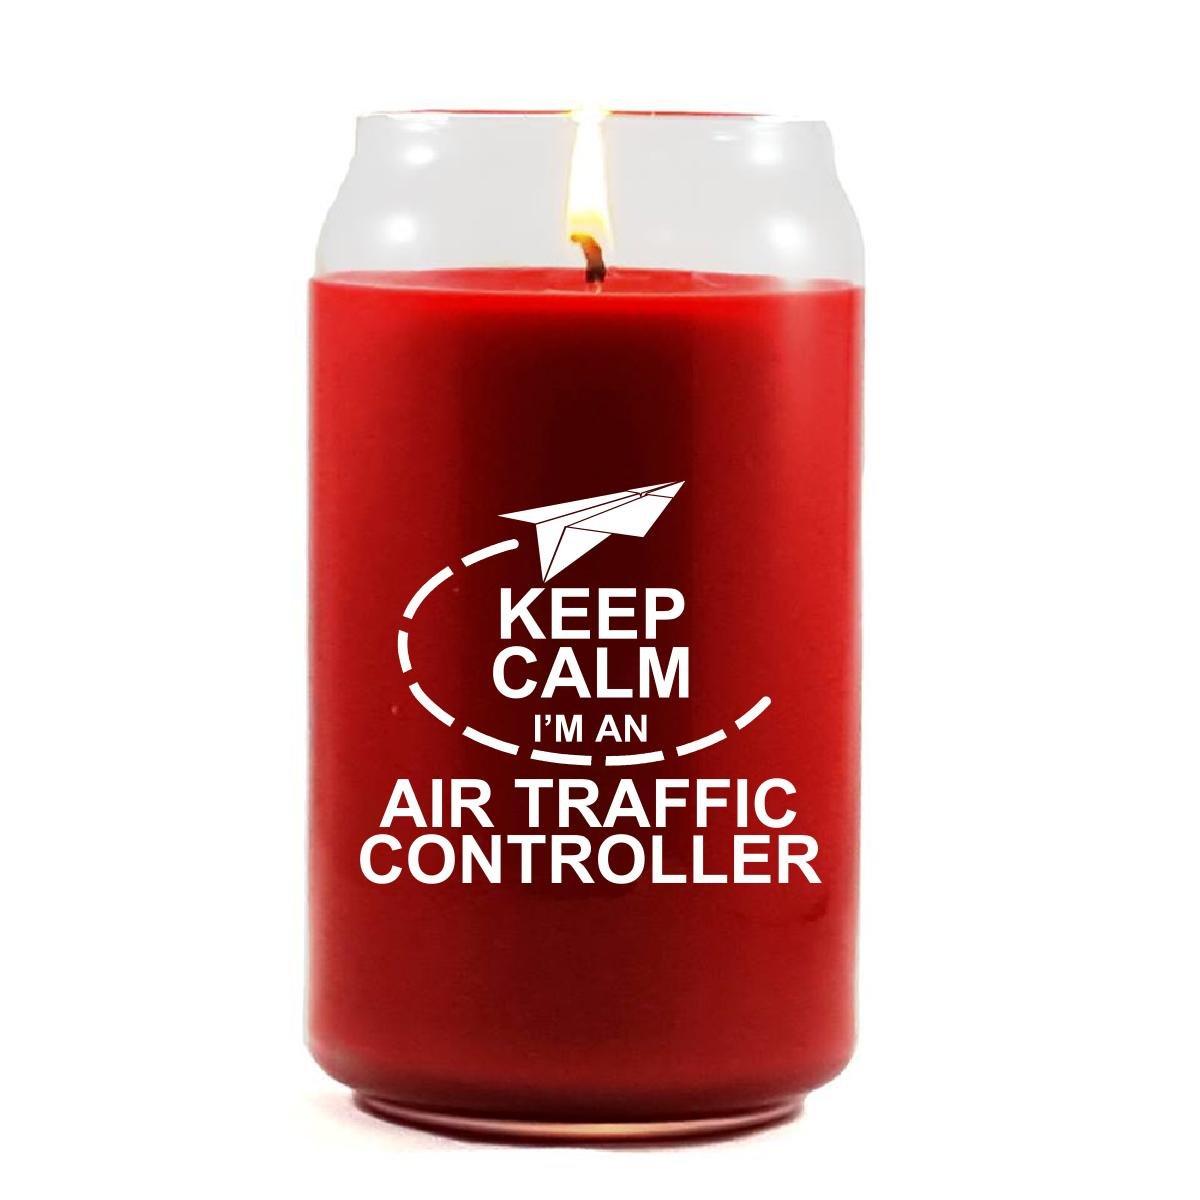 Keep Calm Im An Air Traffic Controller - Scented Candle